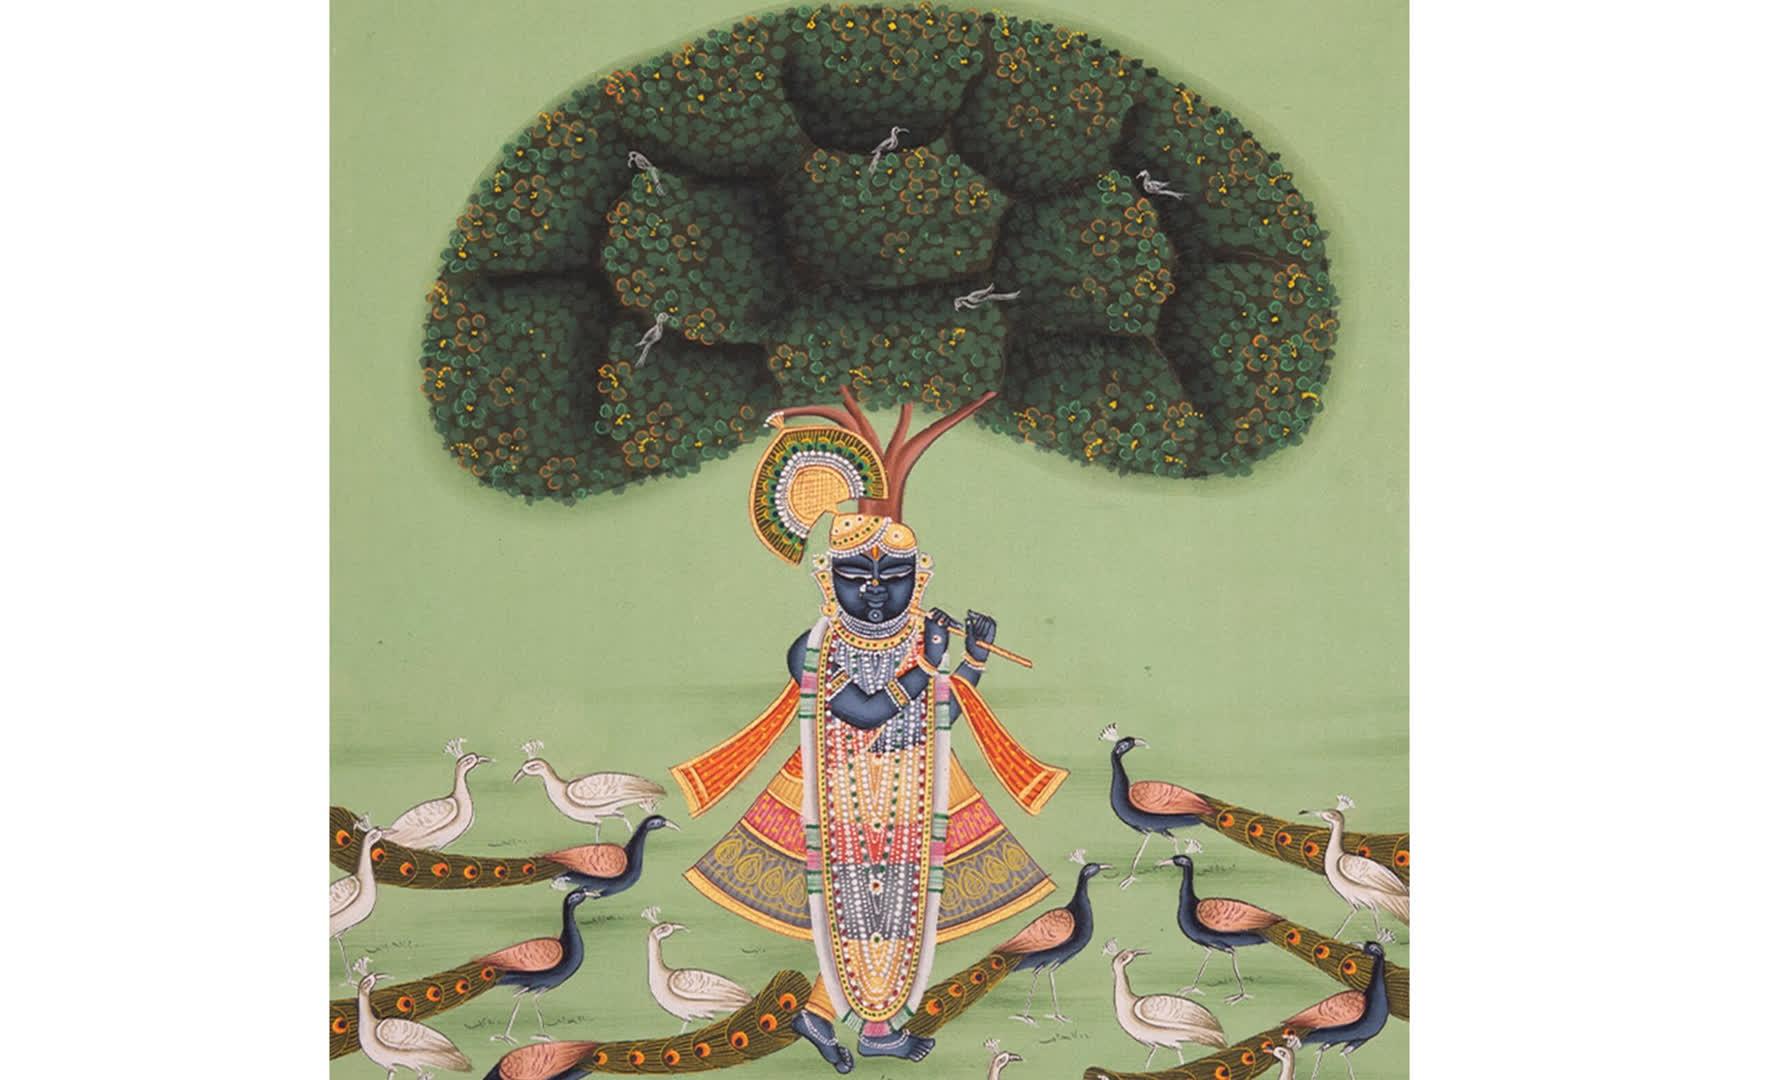 Srinathji standing under the Kadamba tree, surrounded by peacocks